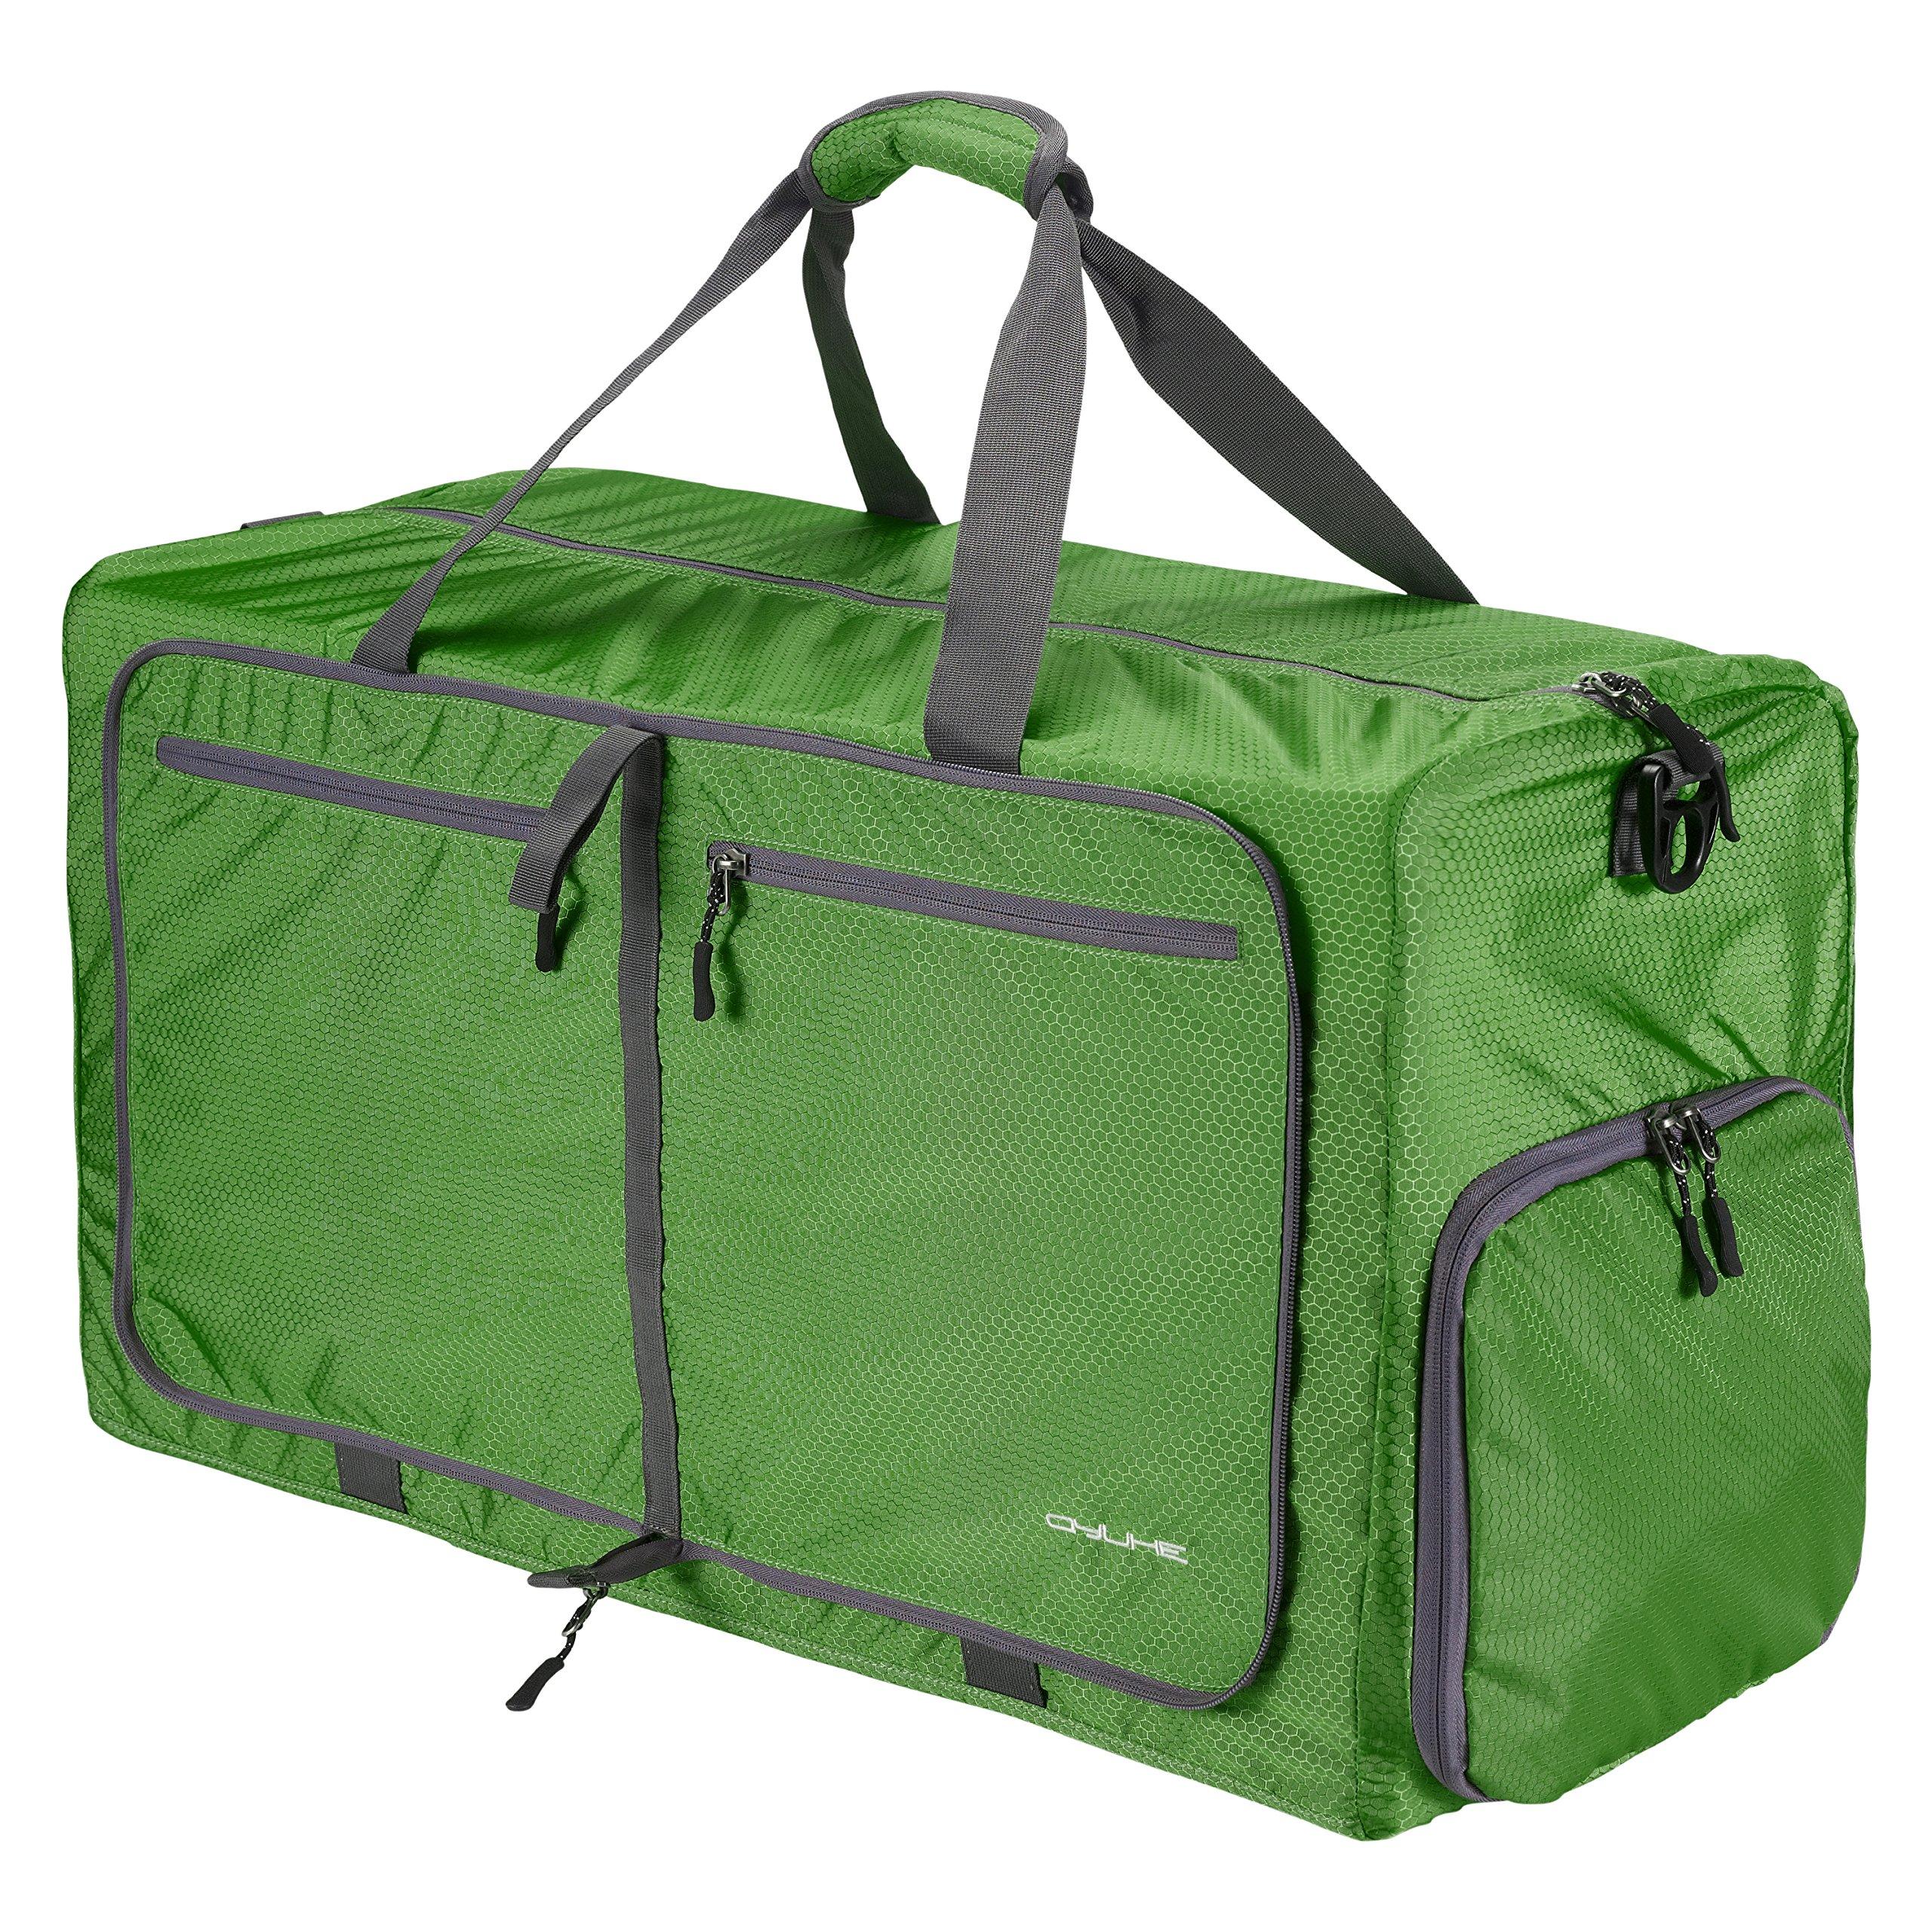 QYUHE 80L Foldable Duffle Bag Extra Large Tear Resistant Luggage Bag for Shopping Travel Gym Sports Men Women Teens (Dark green)